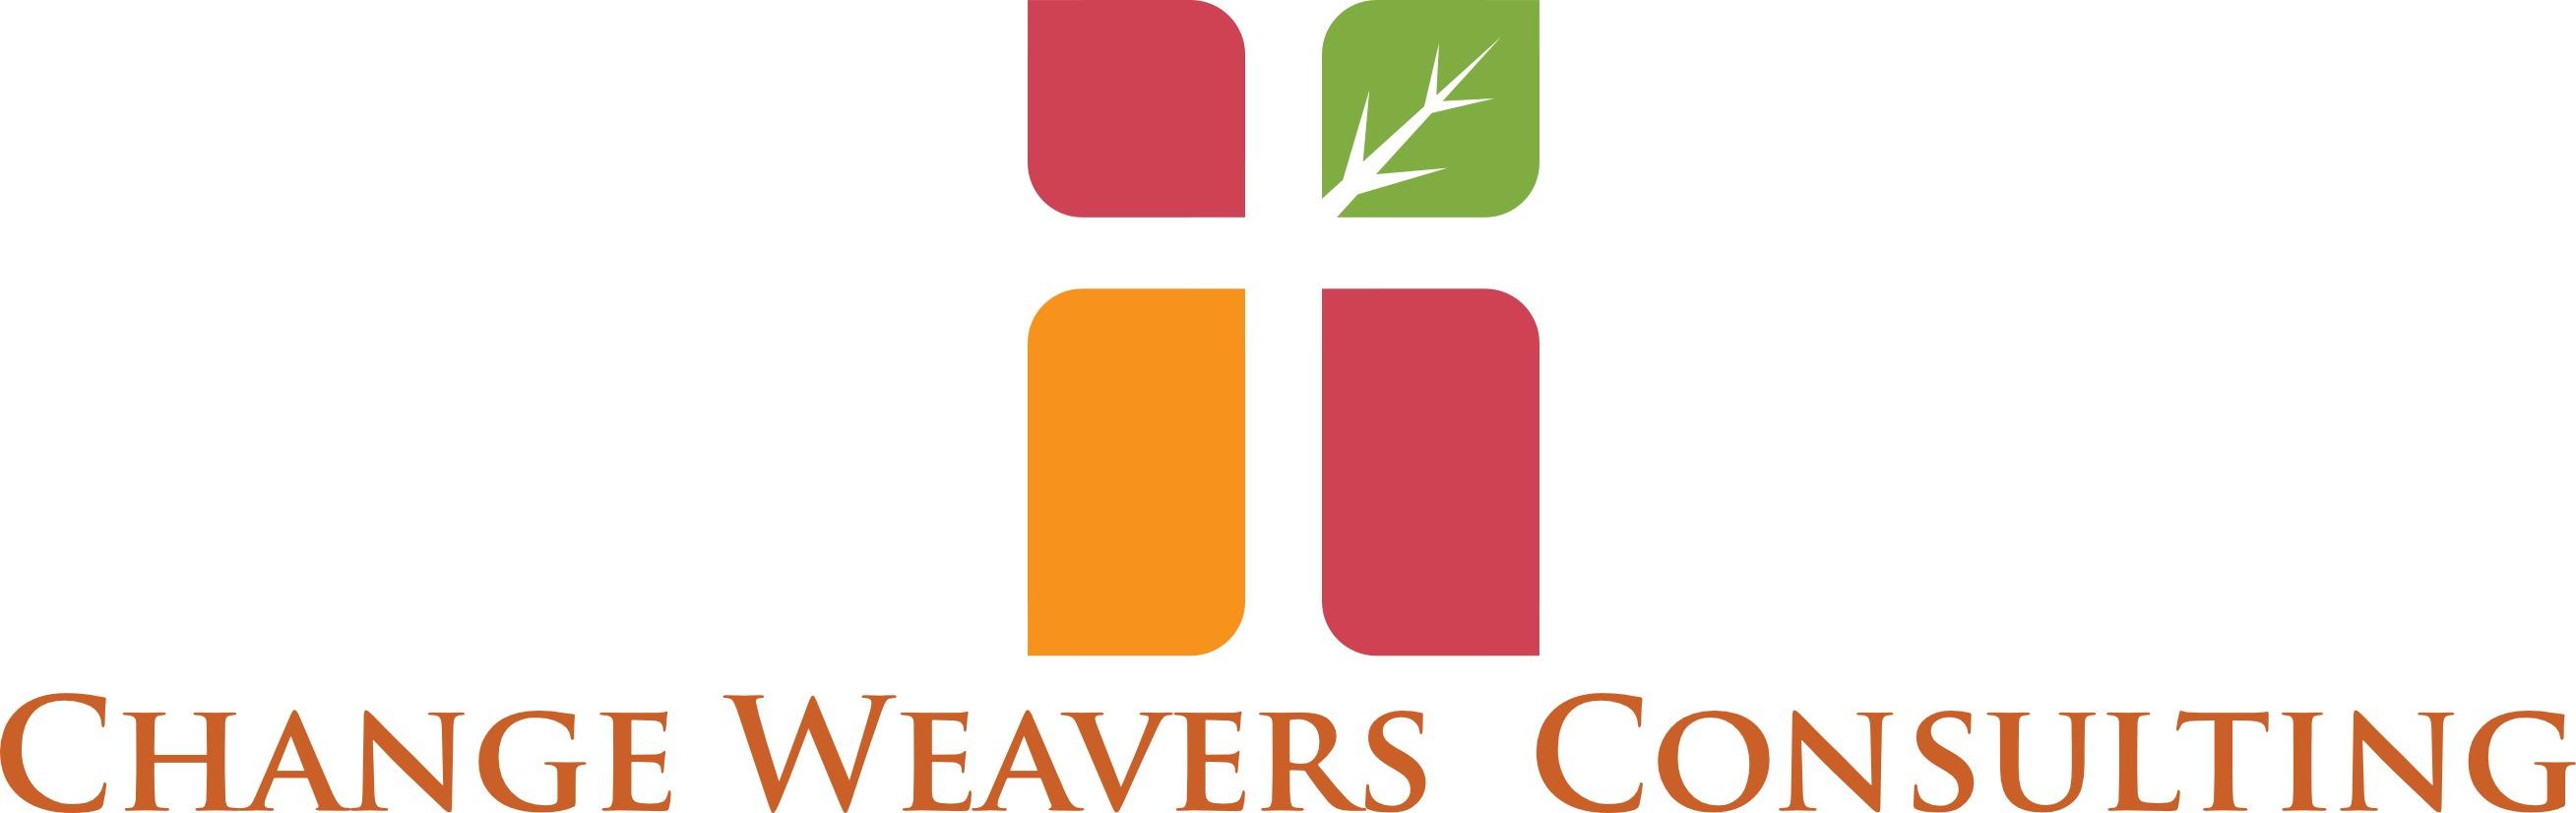 Change Weavers Consulting Logo